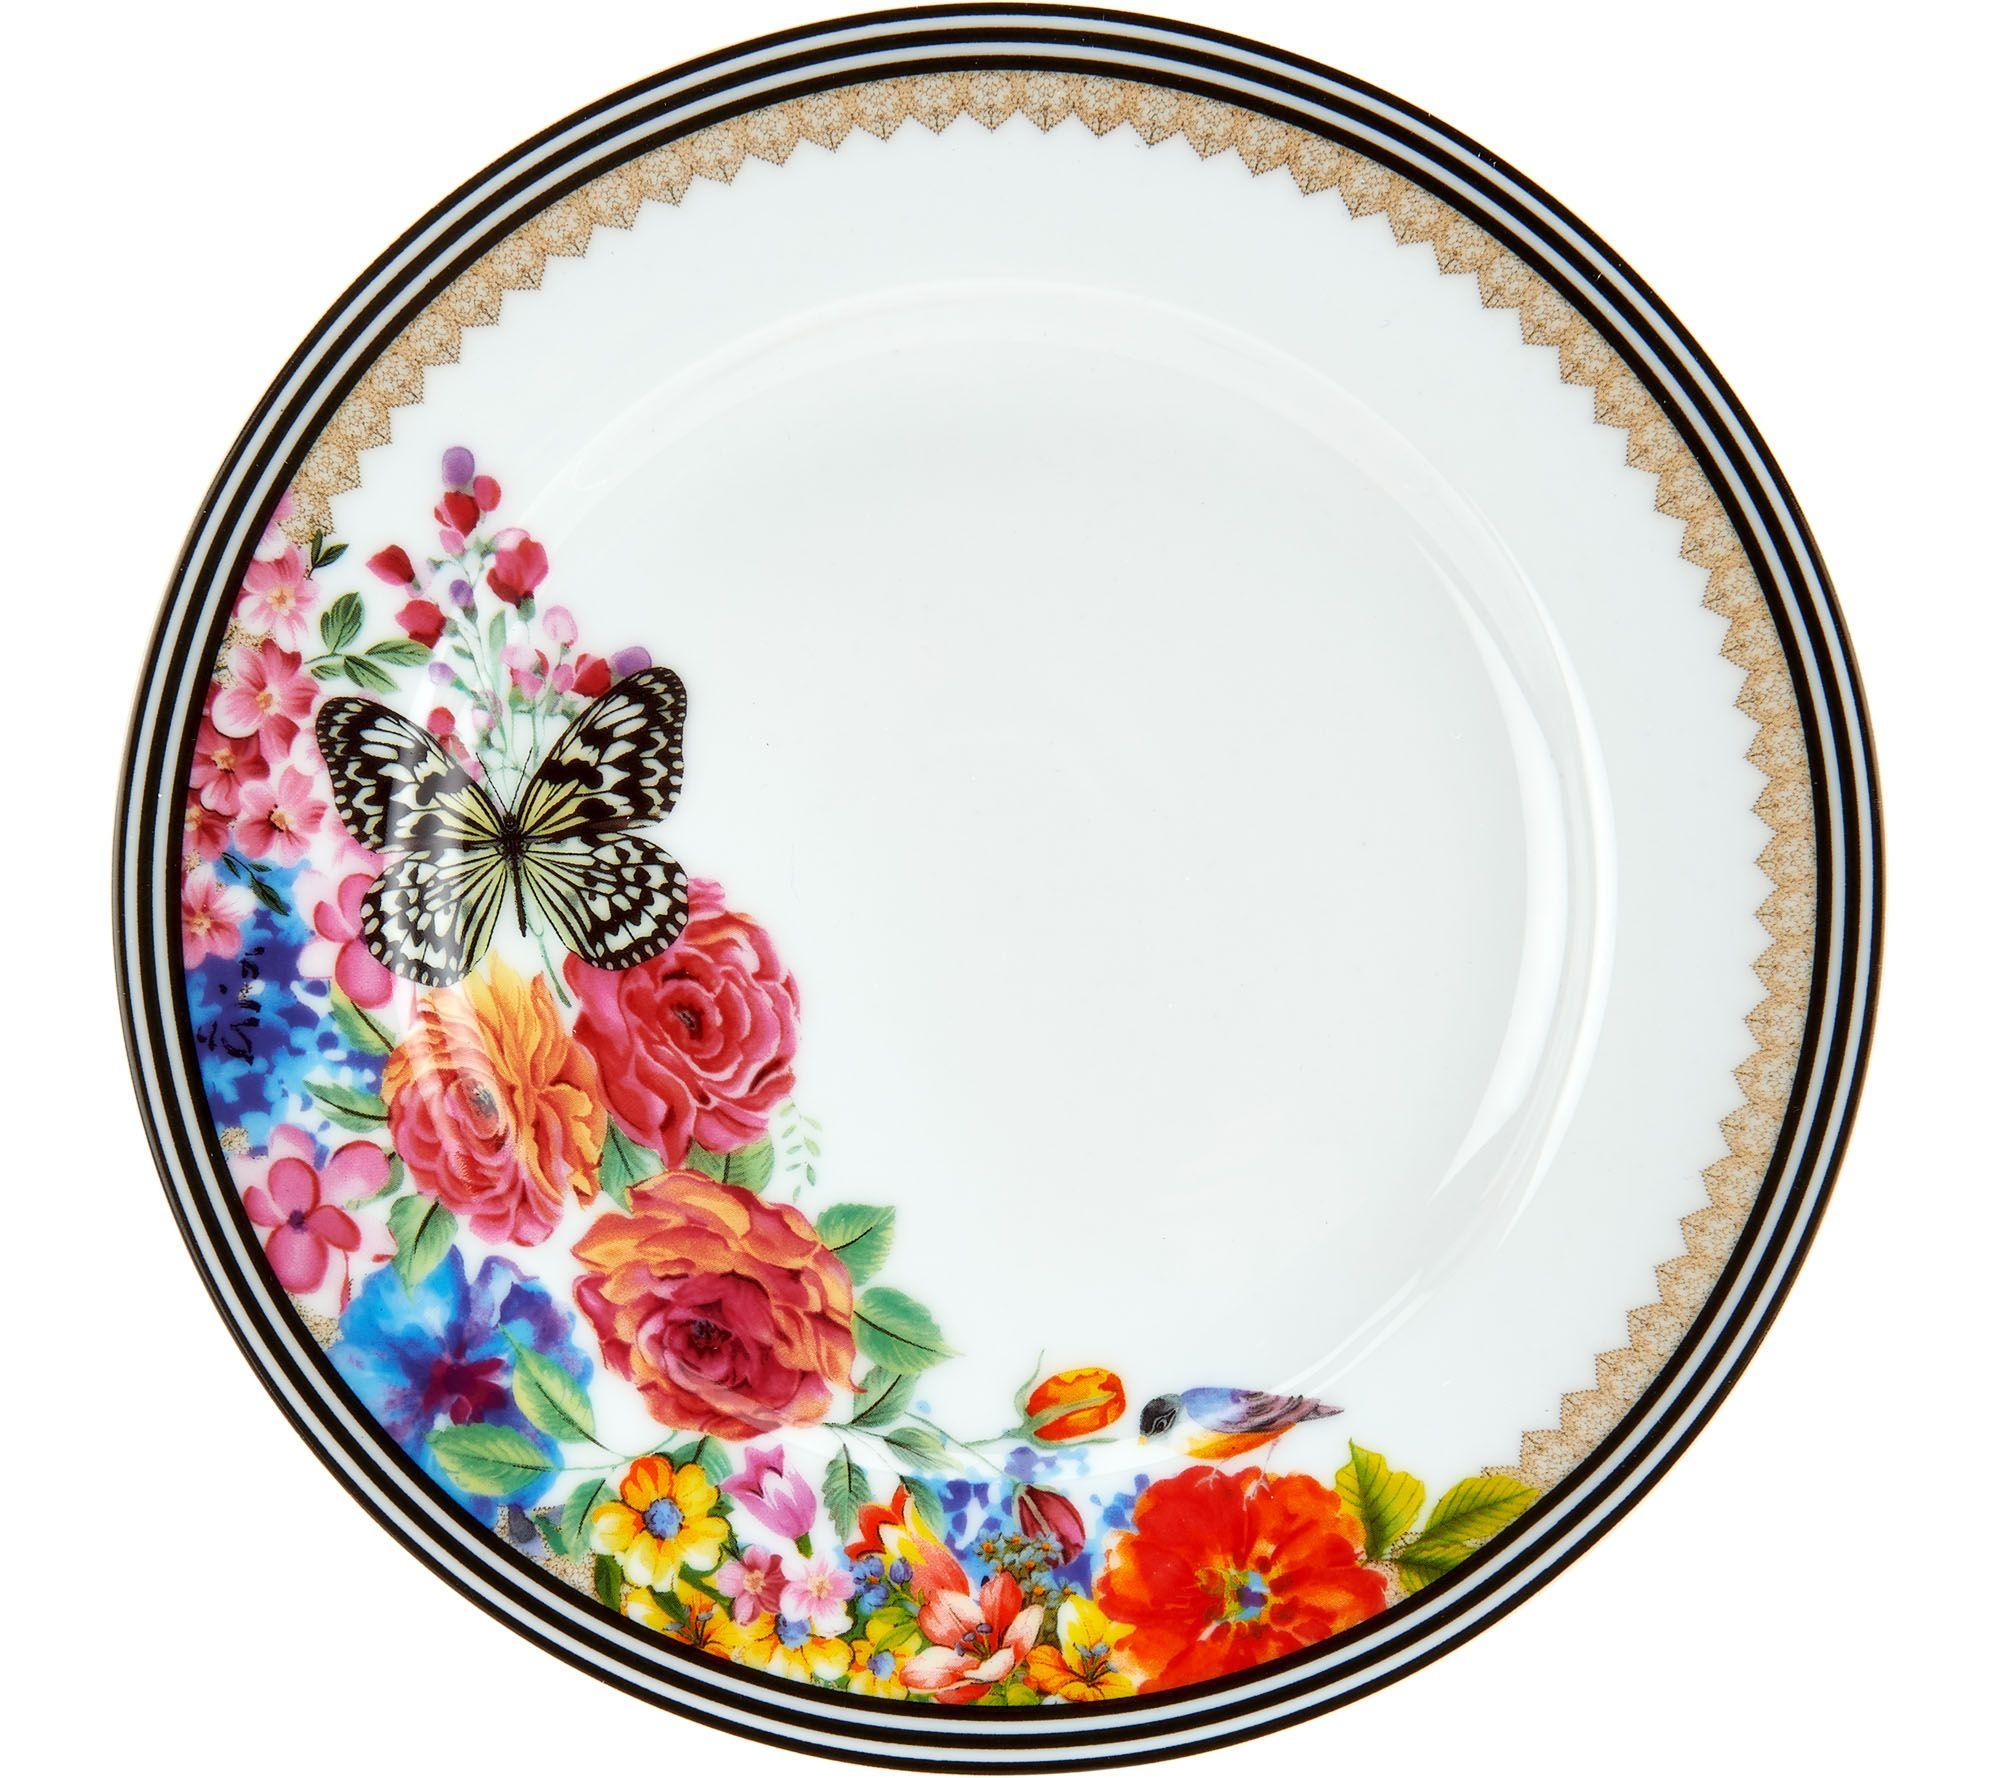 sc 1 st  QVC.com & Lenox Melli Mello Porcelain 16pc Dinnerware Set - Page 1 u2014 QVC.com